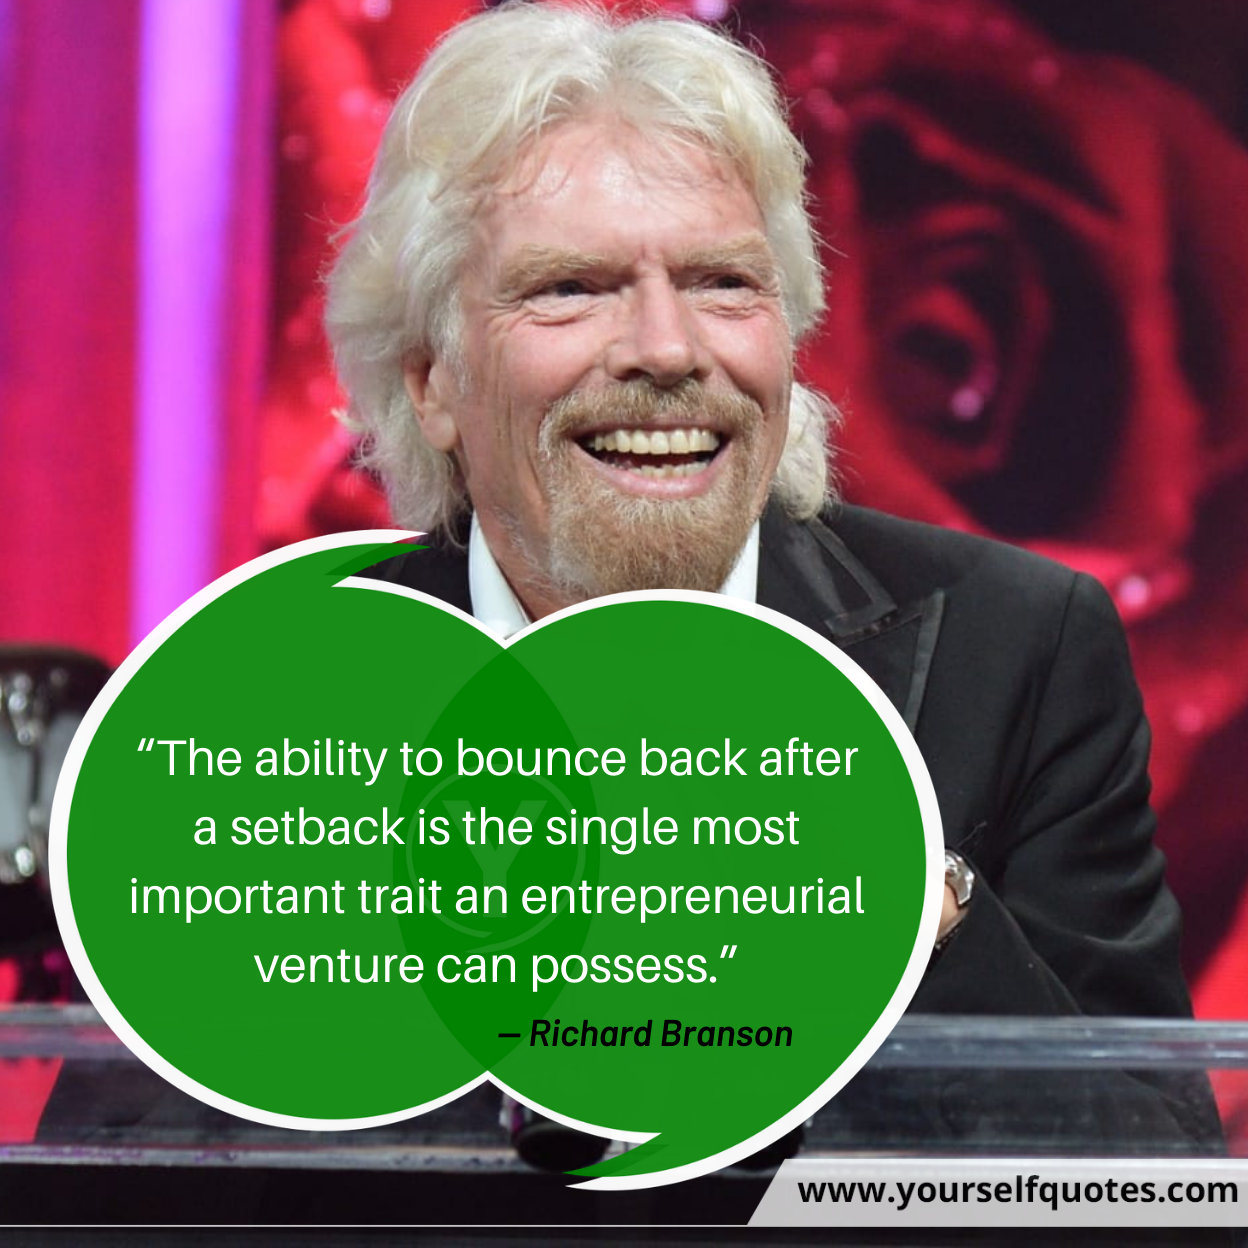 Richard Branson Quotes Wallpaper